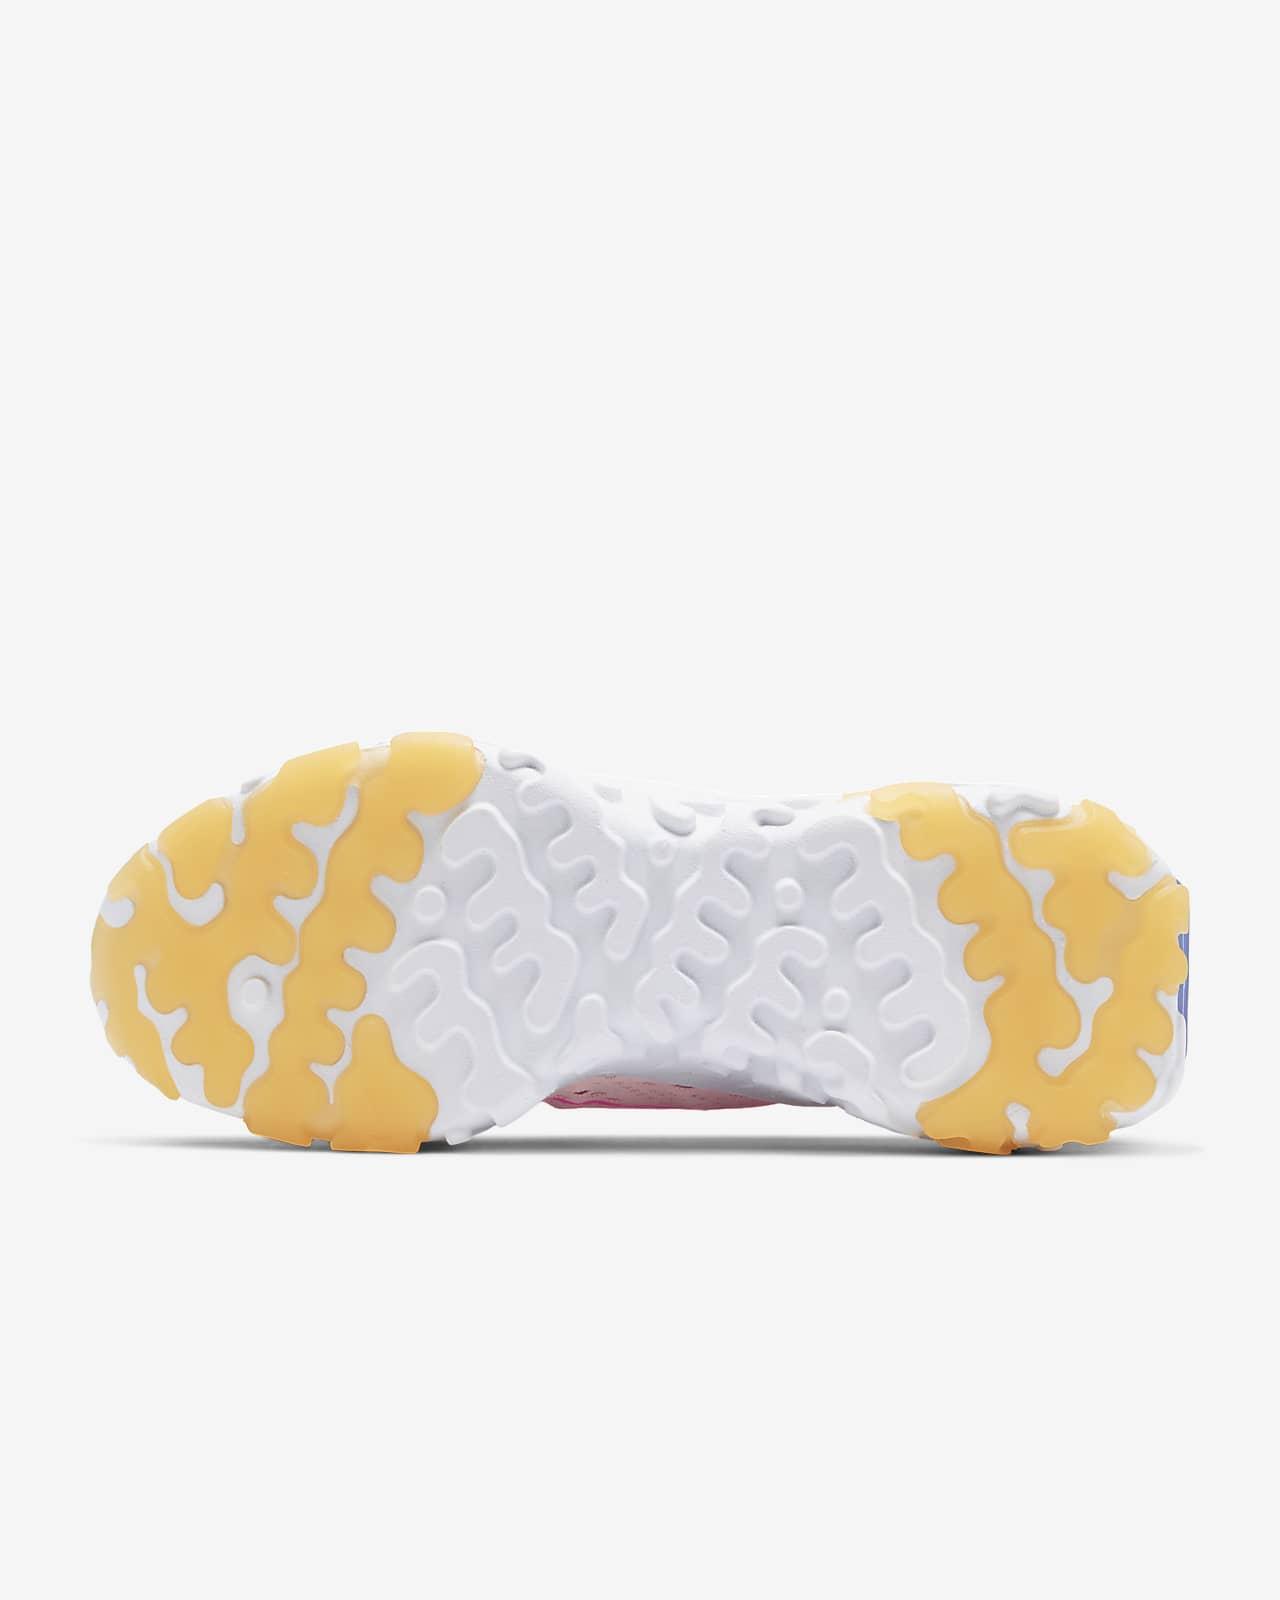 Chaussure Nike React Vision pour Femme. Nike LU